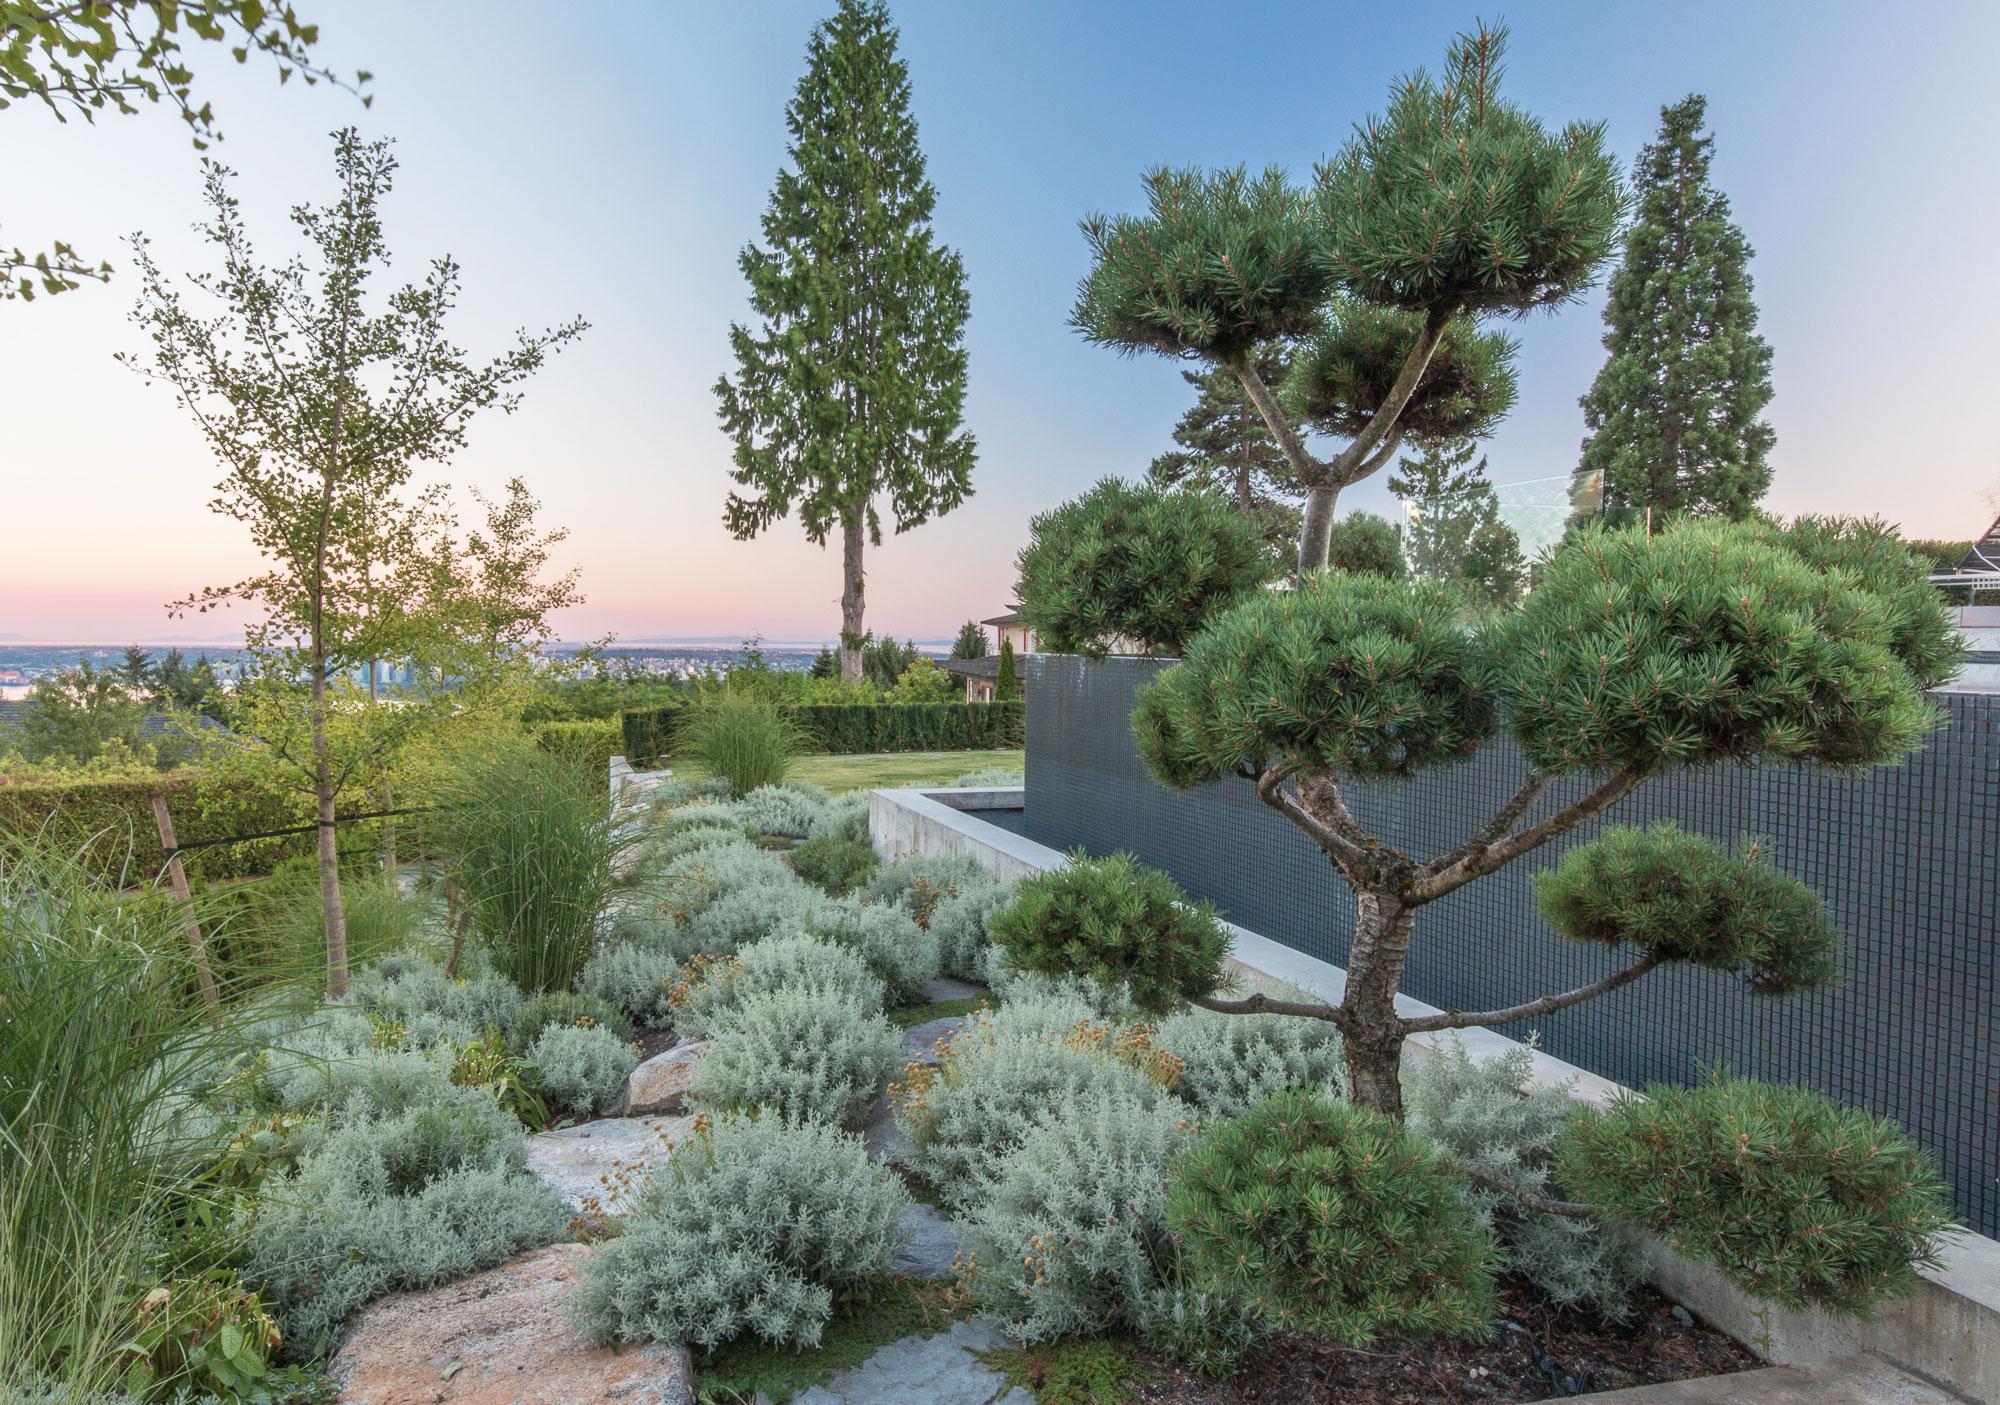 Groveland | Botanica Design | Photo by: Hank White